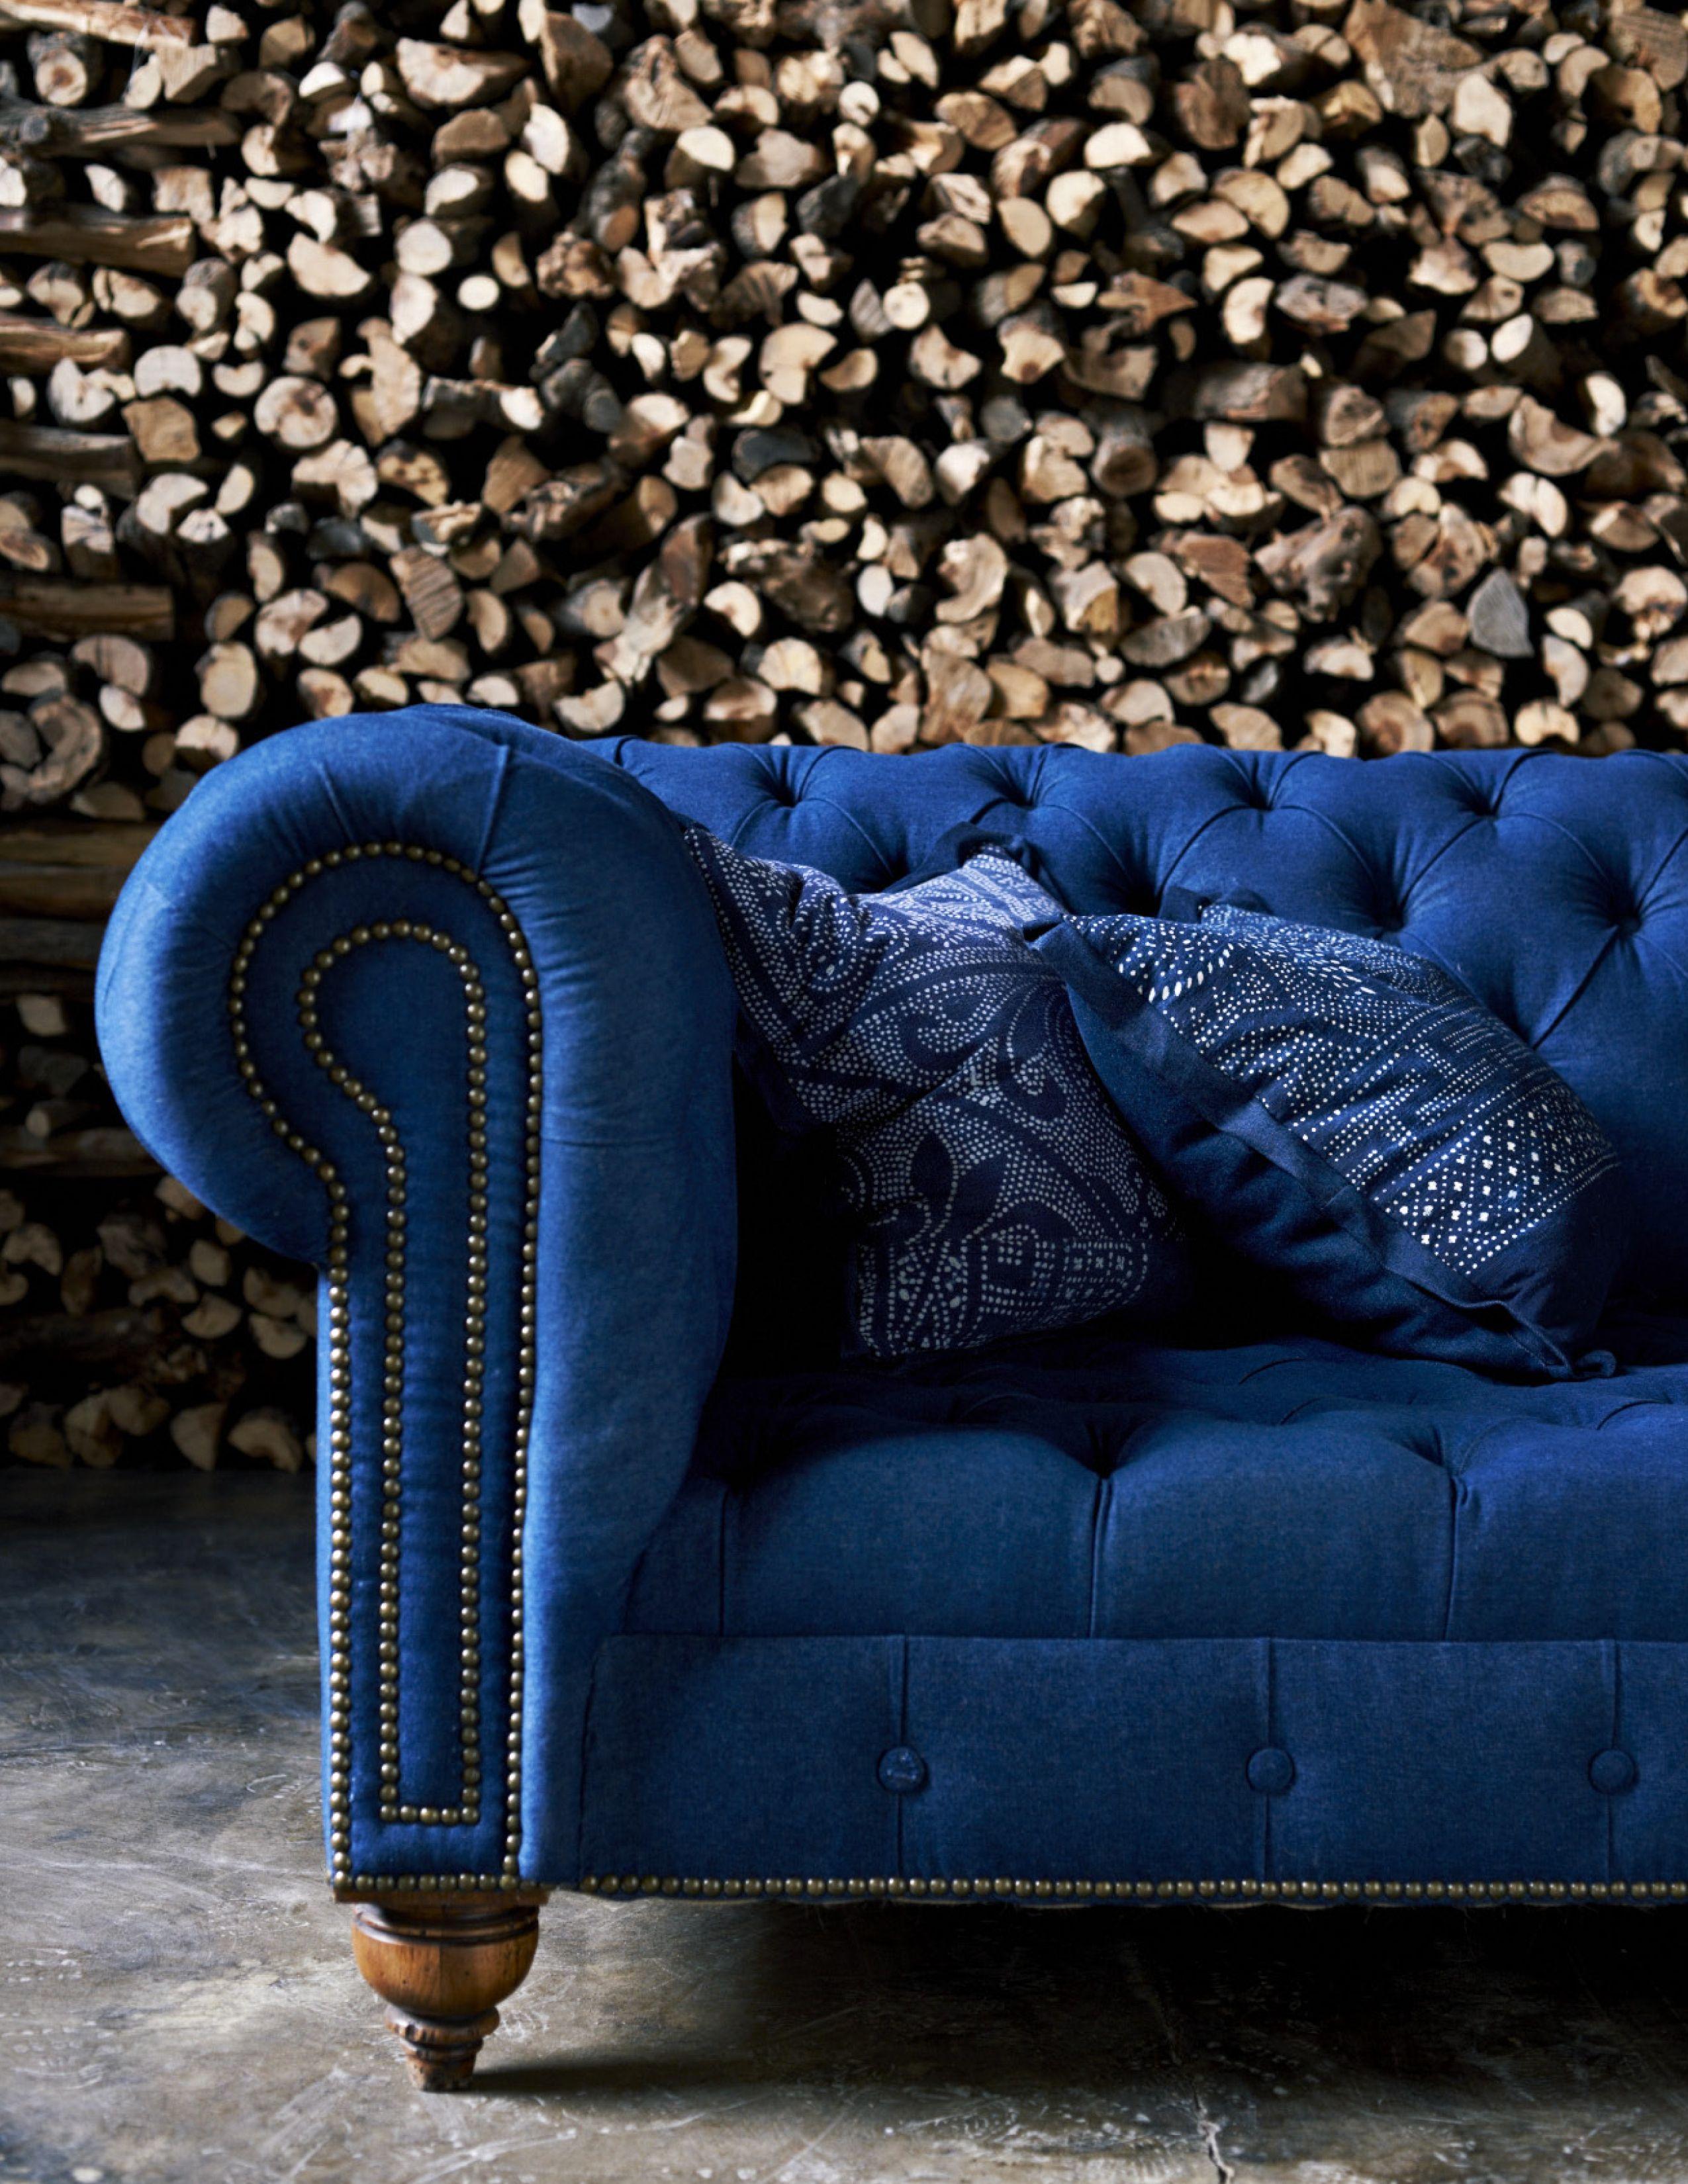 Ralph Lauren Home Collection | INSPIRE Interior design | Pinterest ...